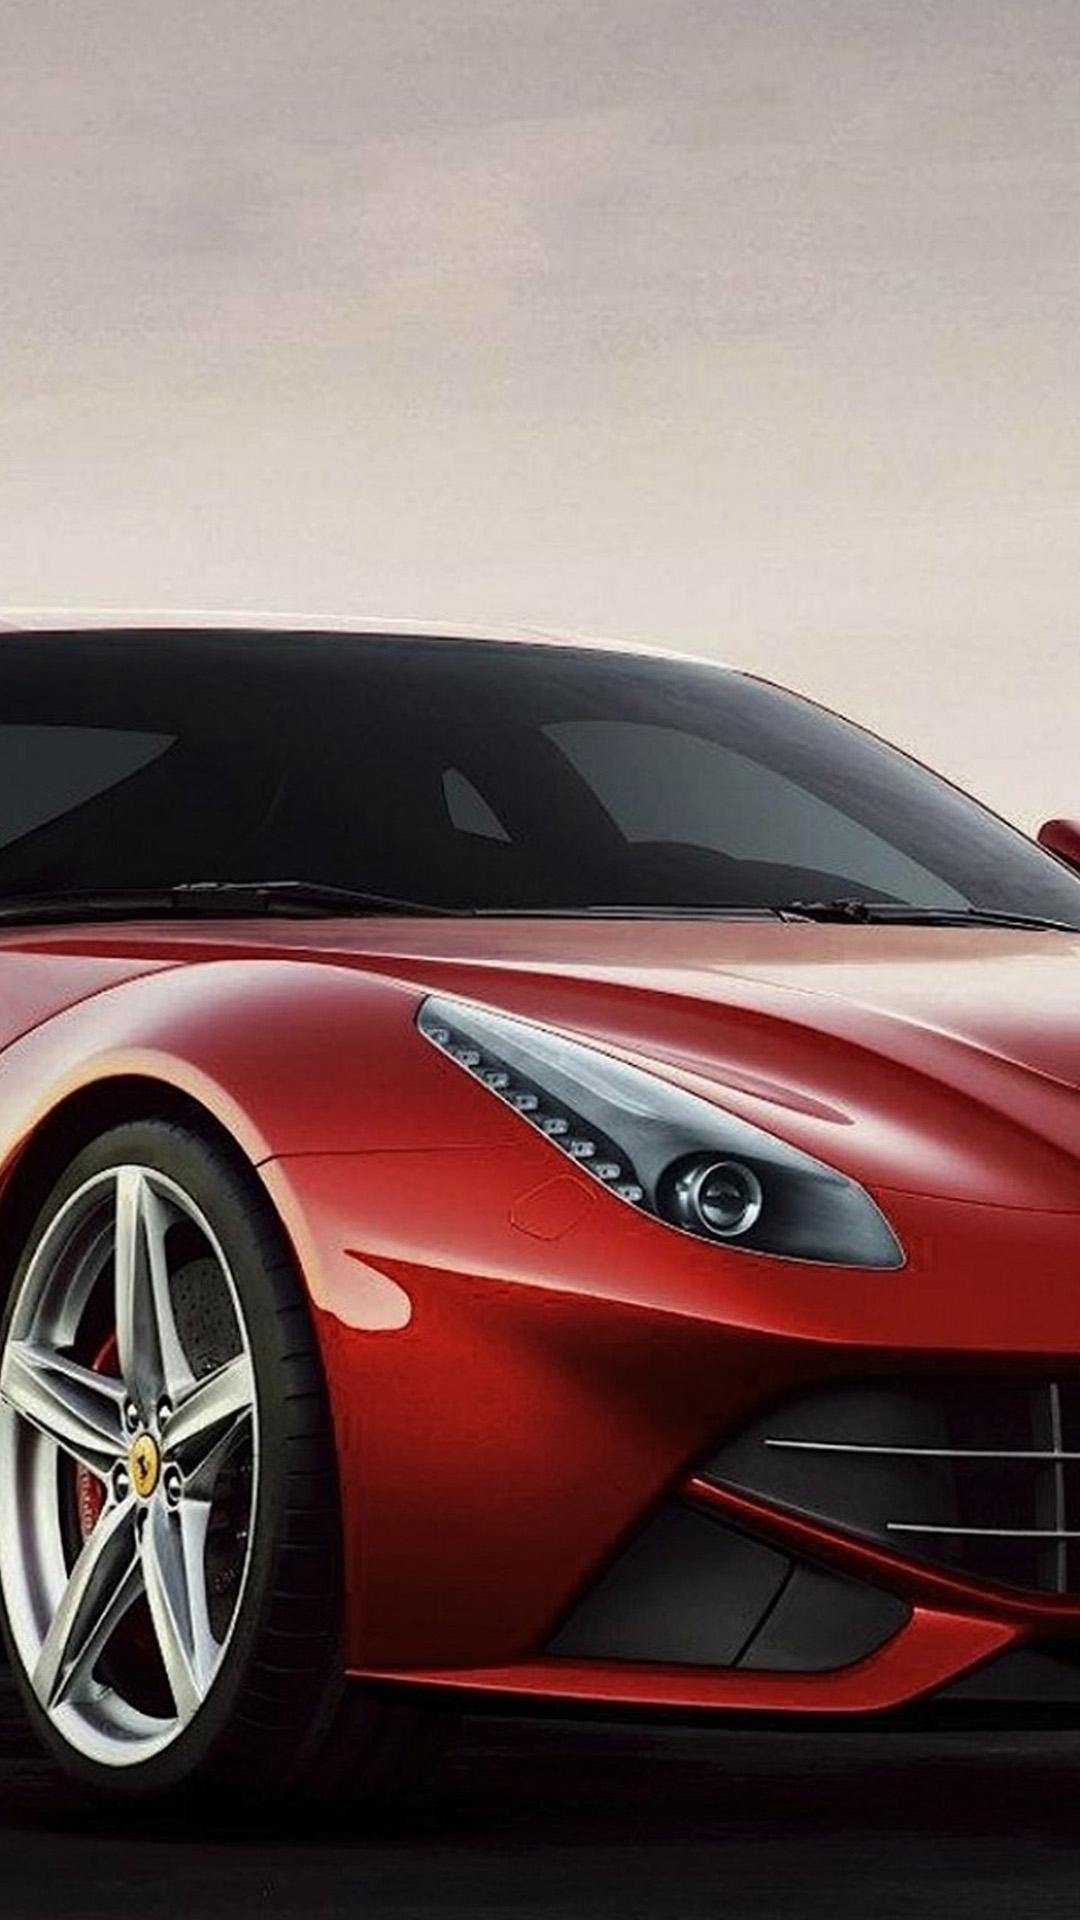 Free Wallpapers Fall Season Ferrari Iphone Wallpapers Pixelstalk Net